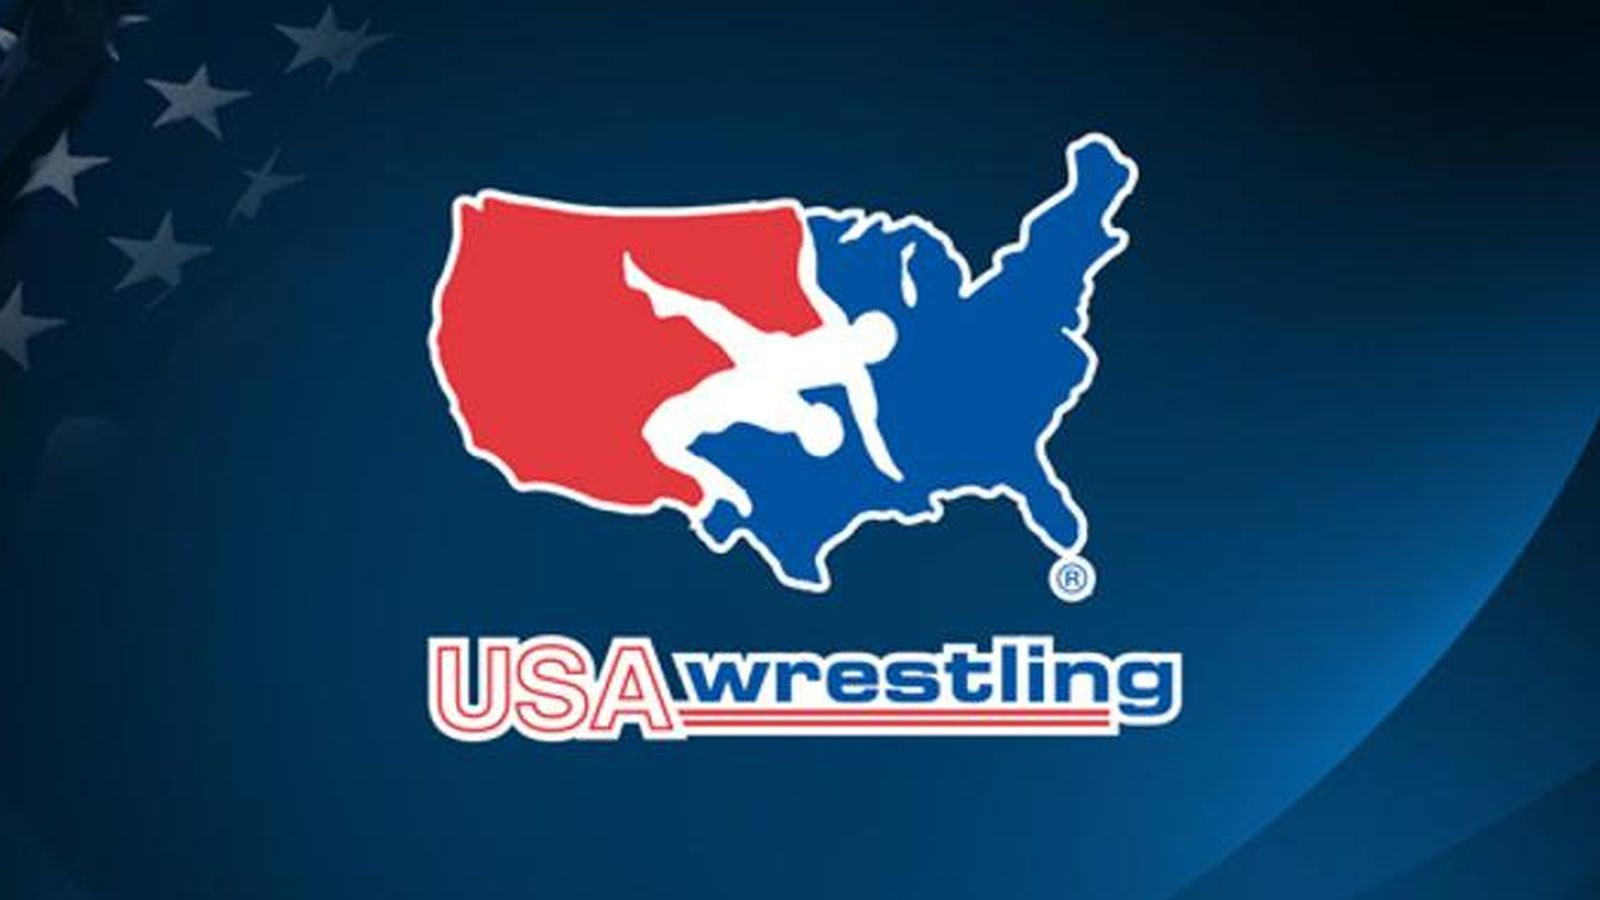 Usa wrestling clipart clip black and white download USA Wrestling Wallpapers - Wallpaper Cave clip black and white download